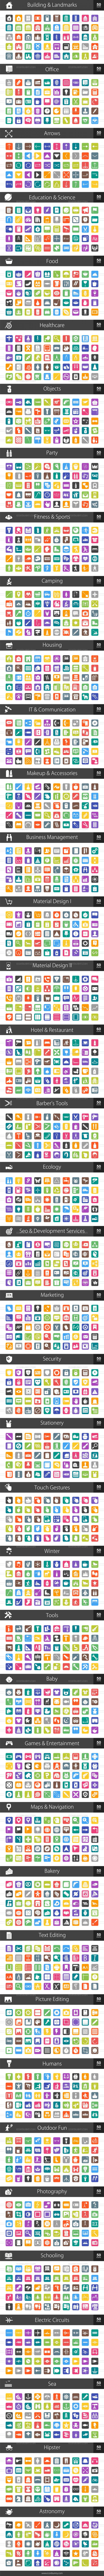 2010 Flat Round Corner Icons Bundle - Preview - IconBunny